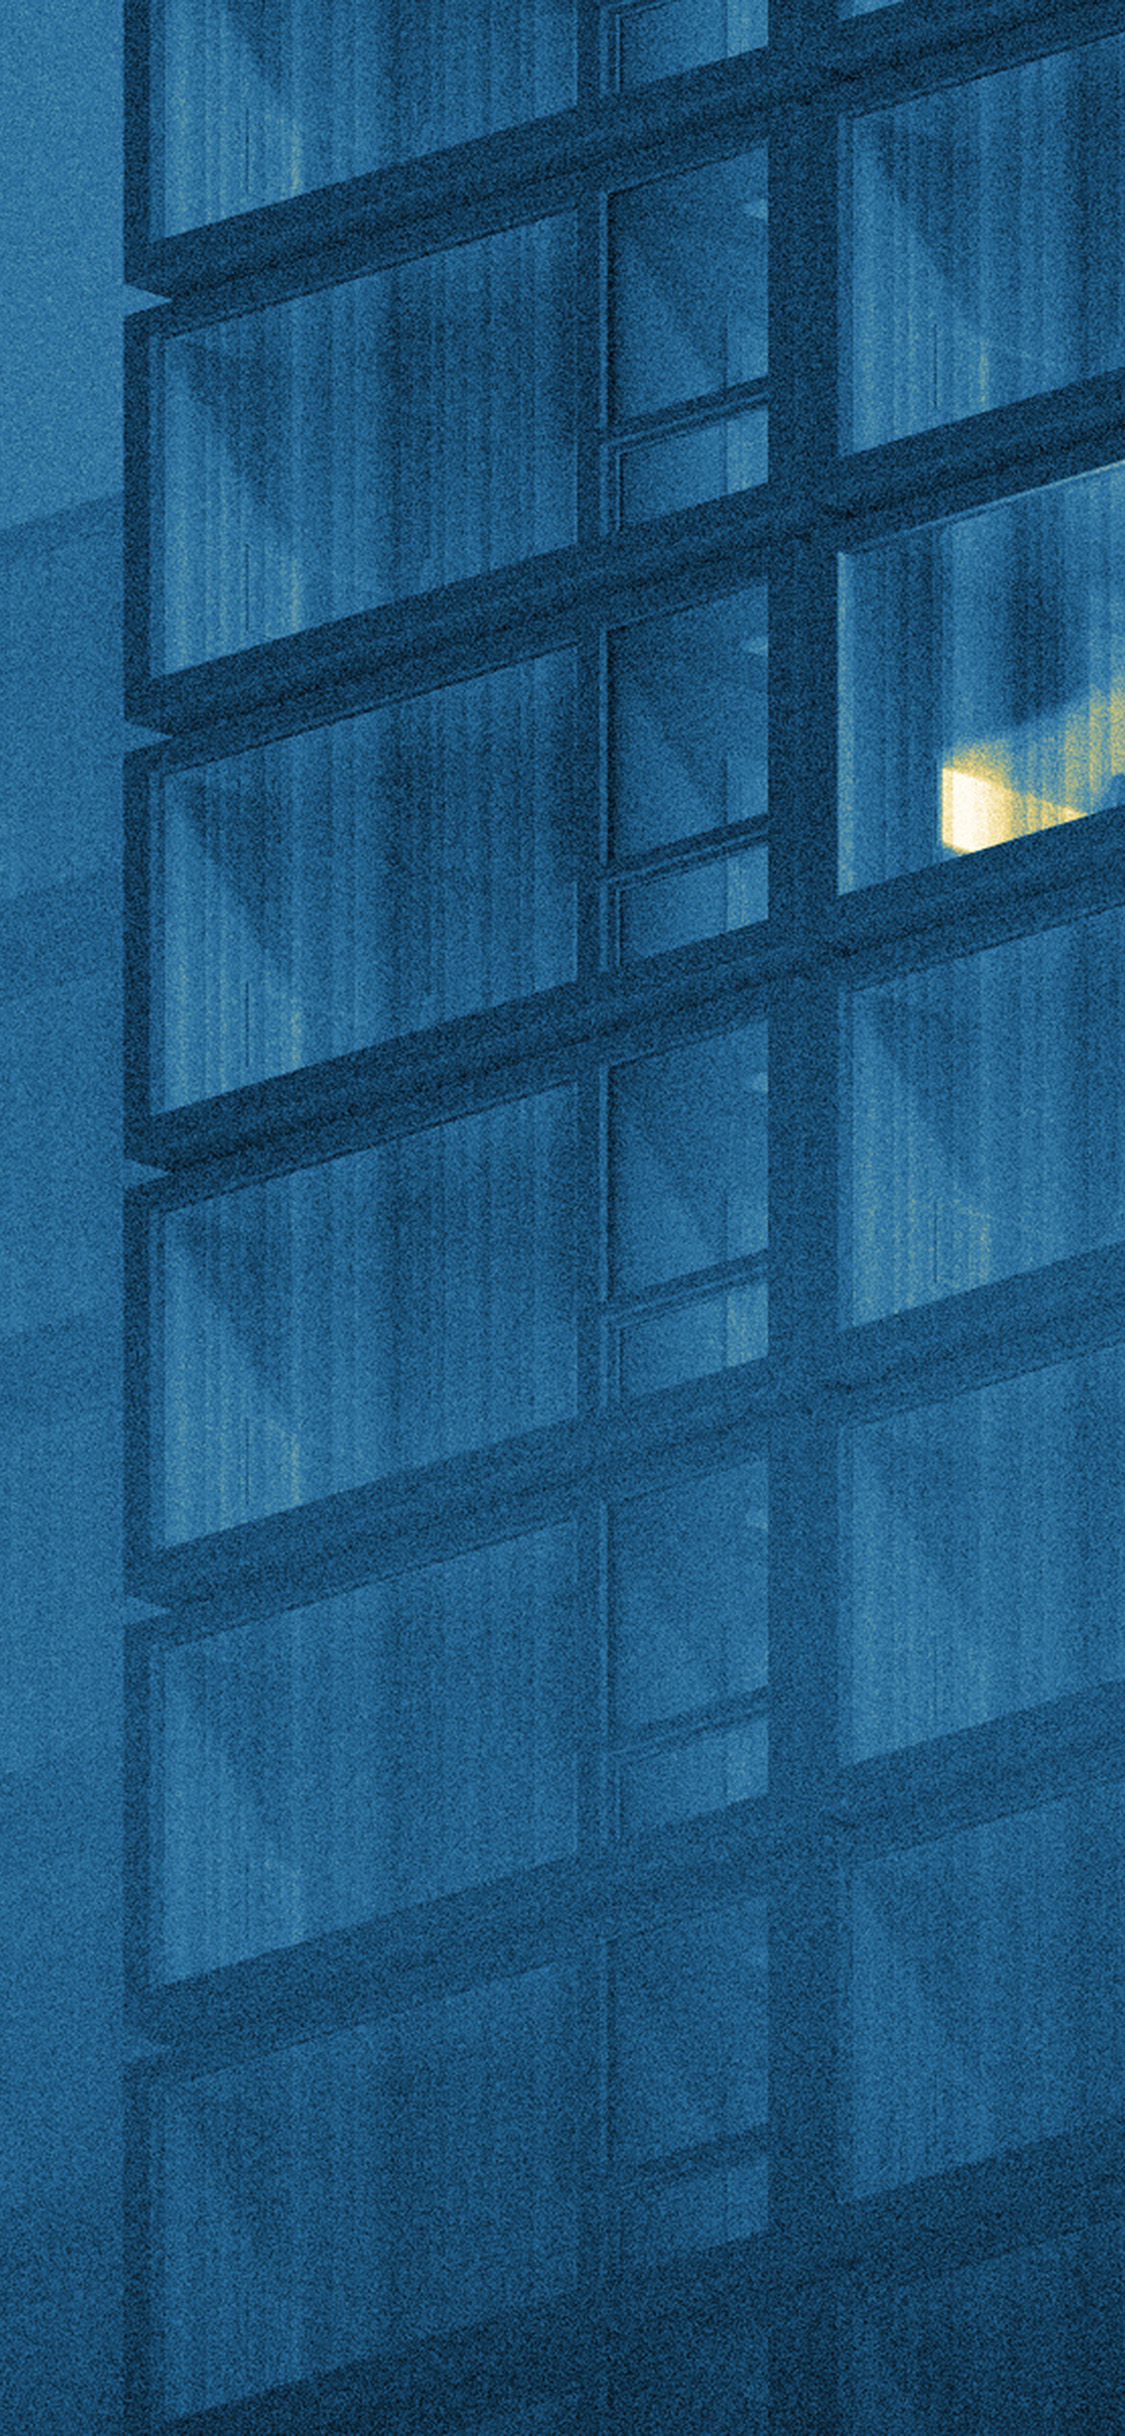 iPhonexpapers.com-Apple-iPhone-wallpaper-bk54-art-blue-night-office-illust